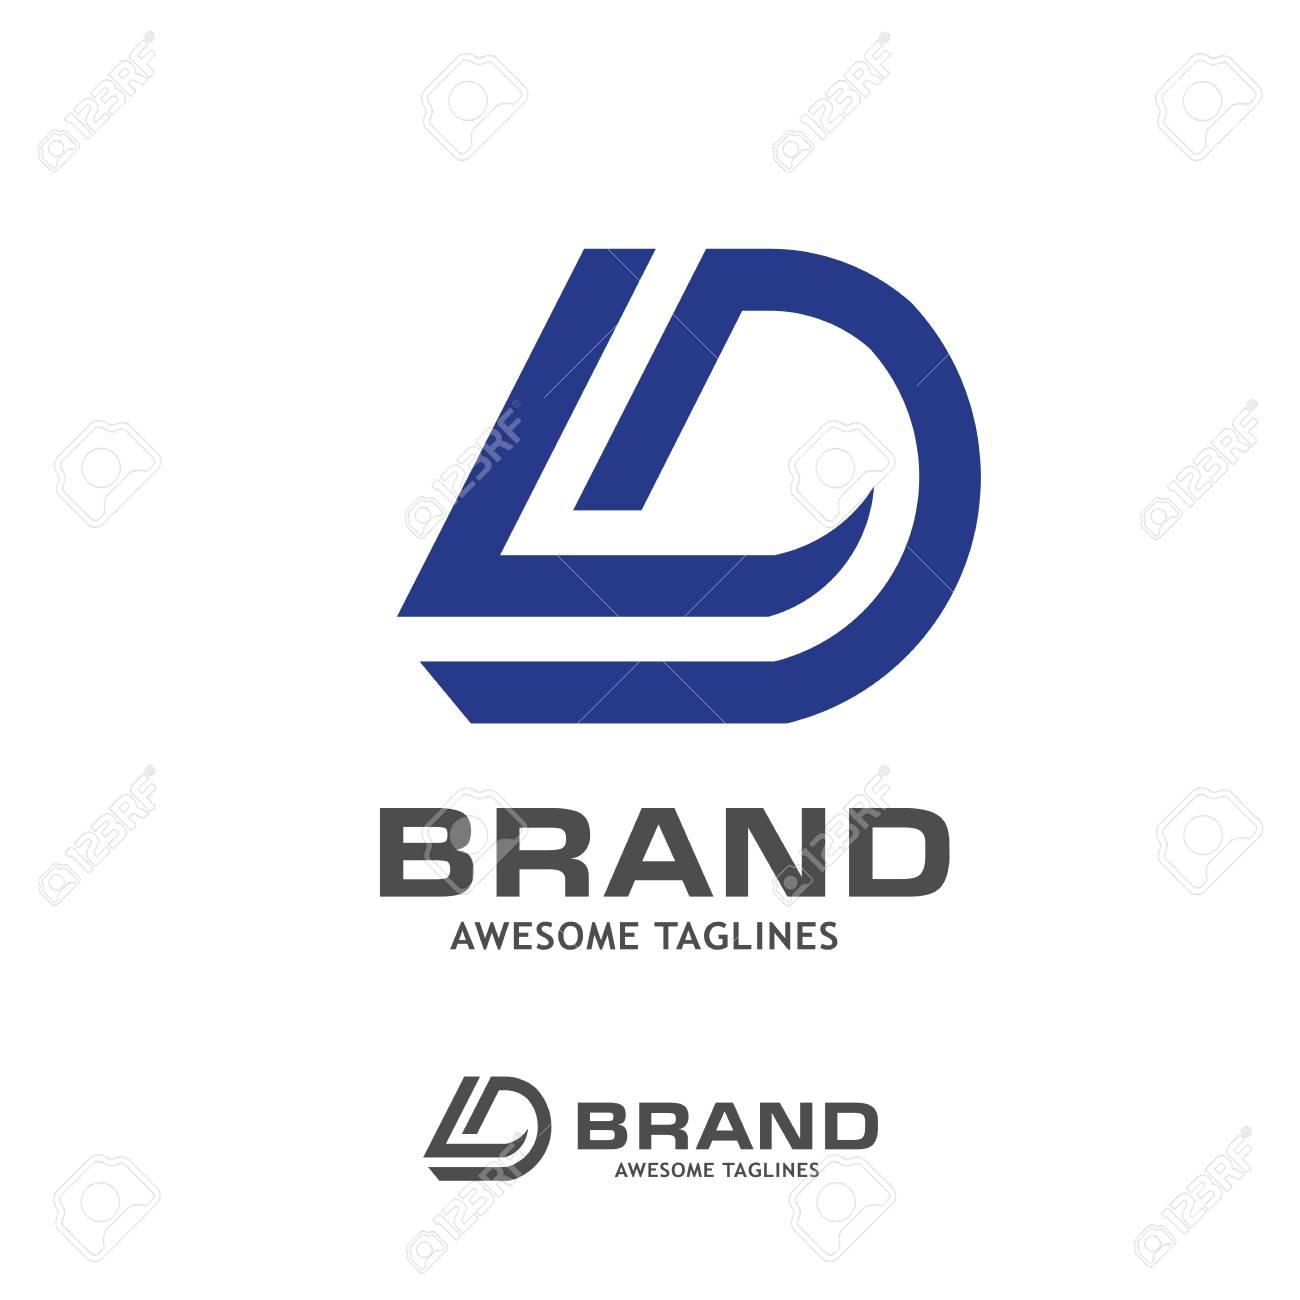 Dl Letter Logo Design Vector Illustration Template D Letter Logo Royalty Free Cliparts Vectors And Stock Illustration Image 89177757